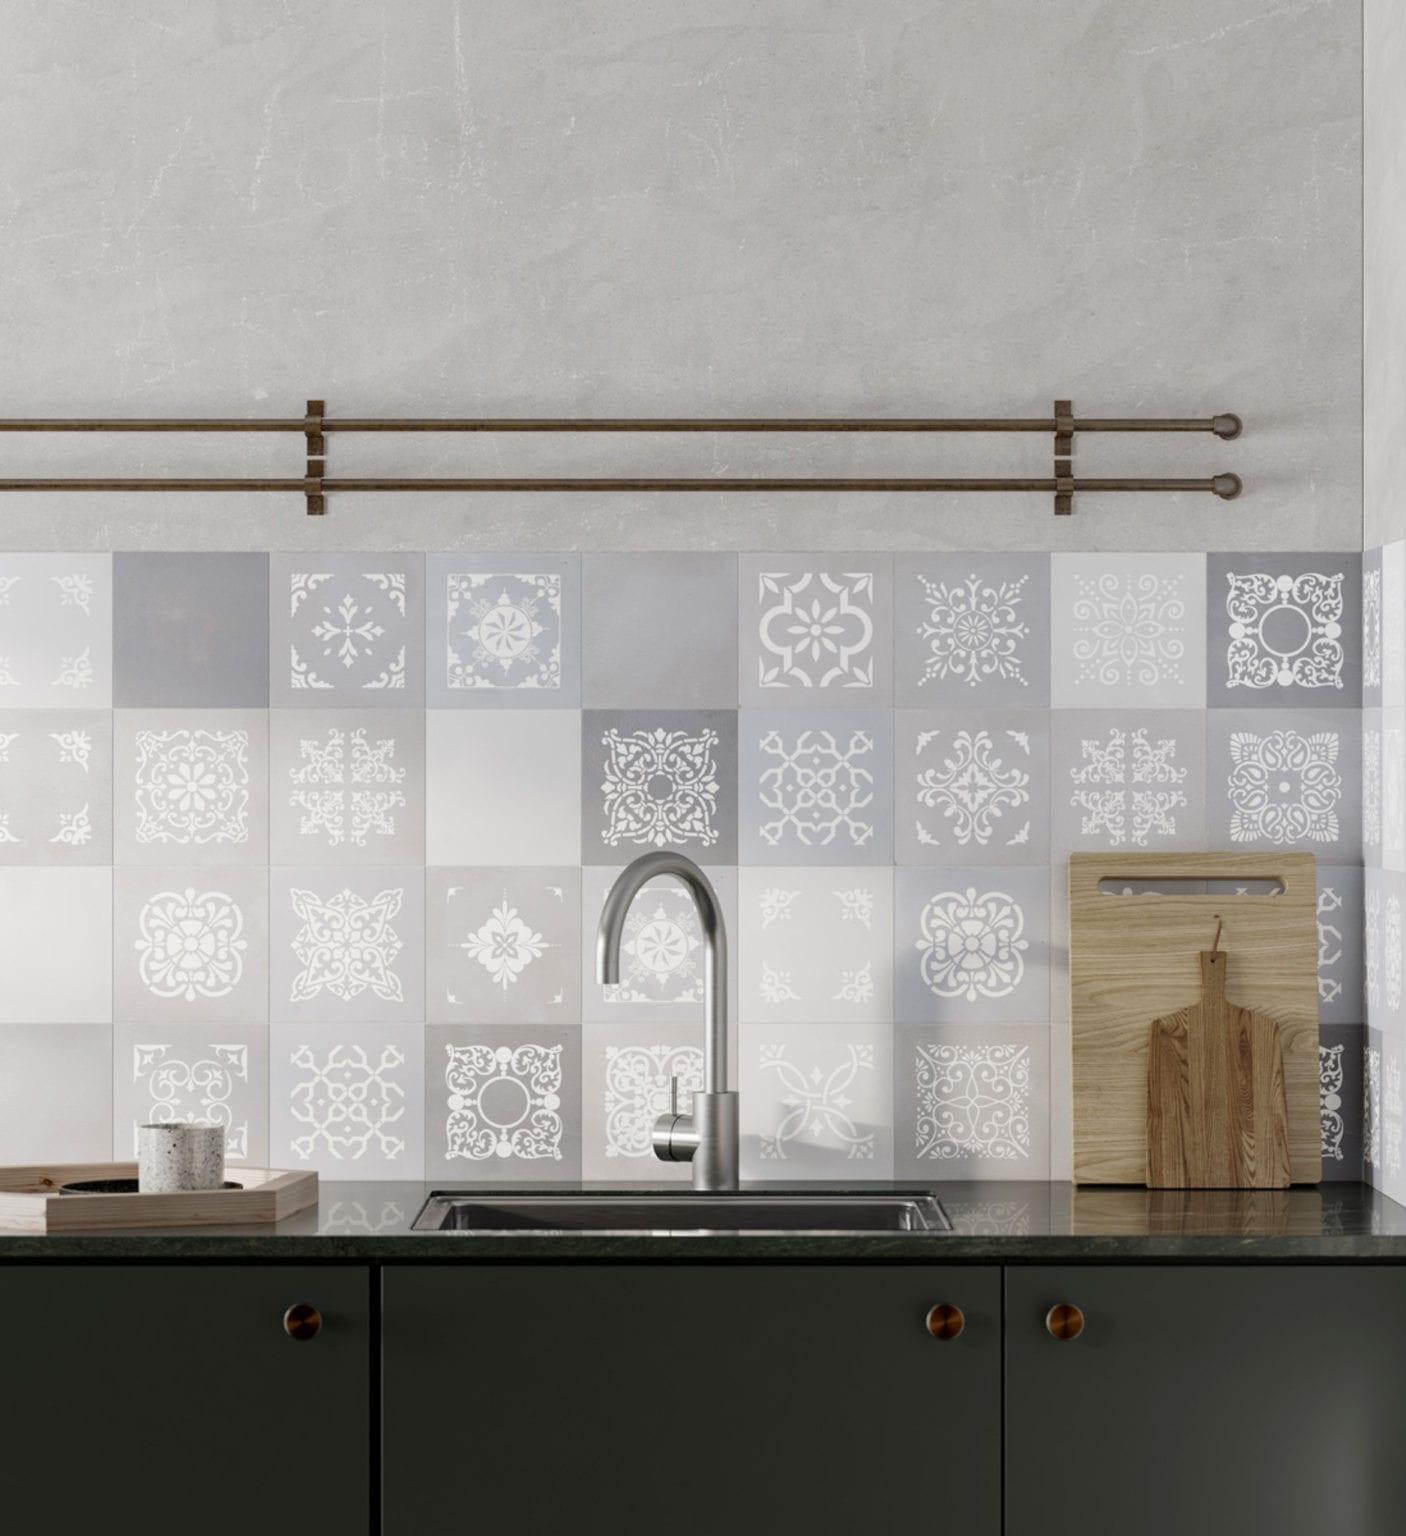 carrelage-mural-carreau-ciment-delice-16.5x16.5